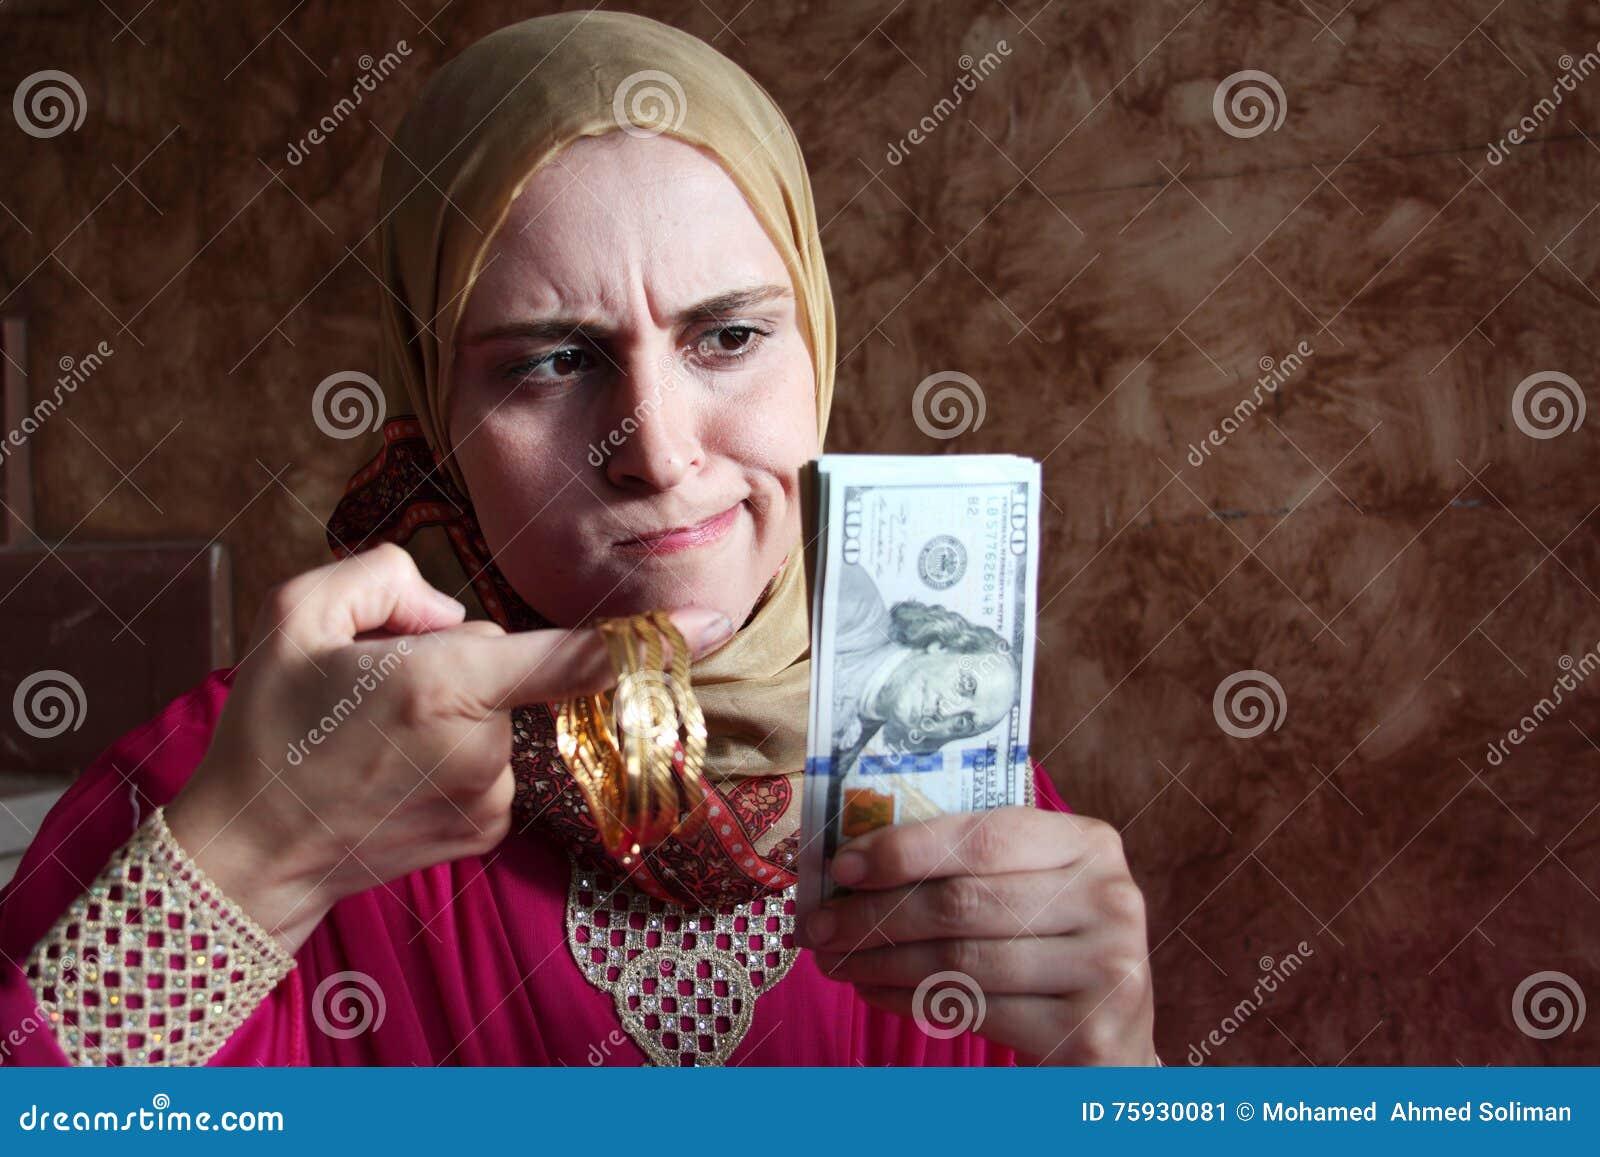 cash muslim girl personals Results 1 - 12  100% free muslim personals muslim women gallery.